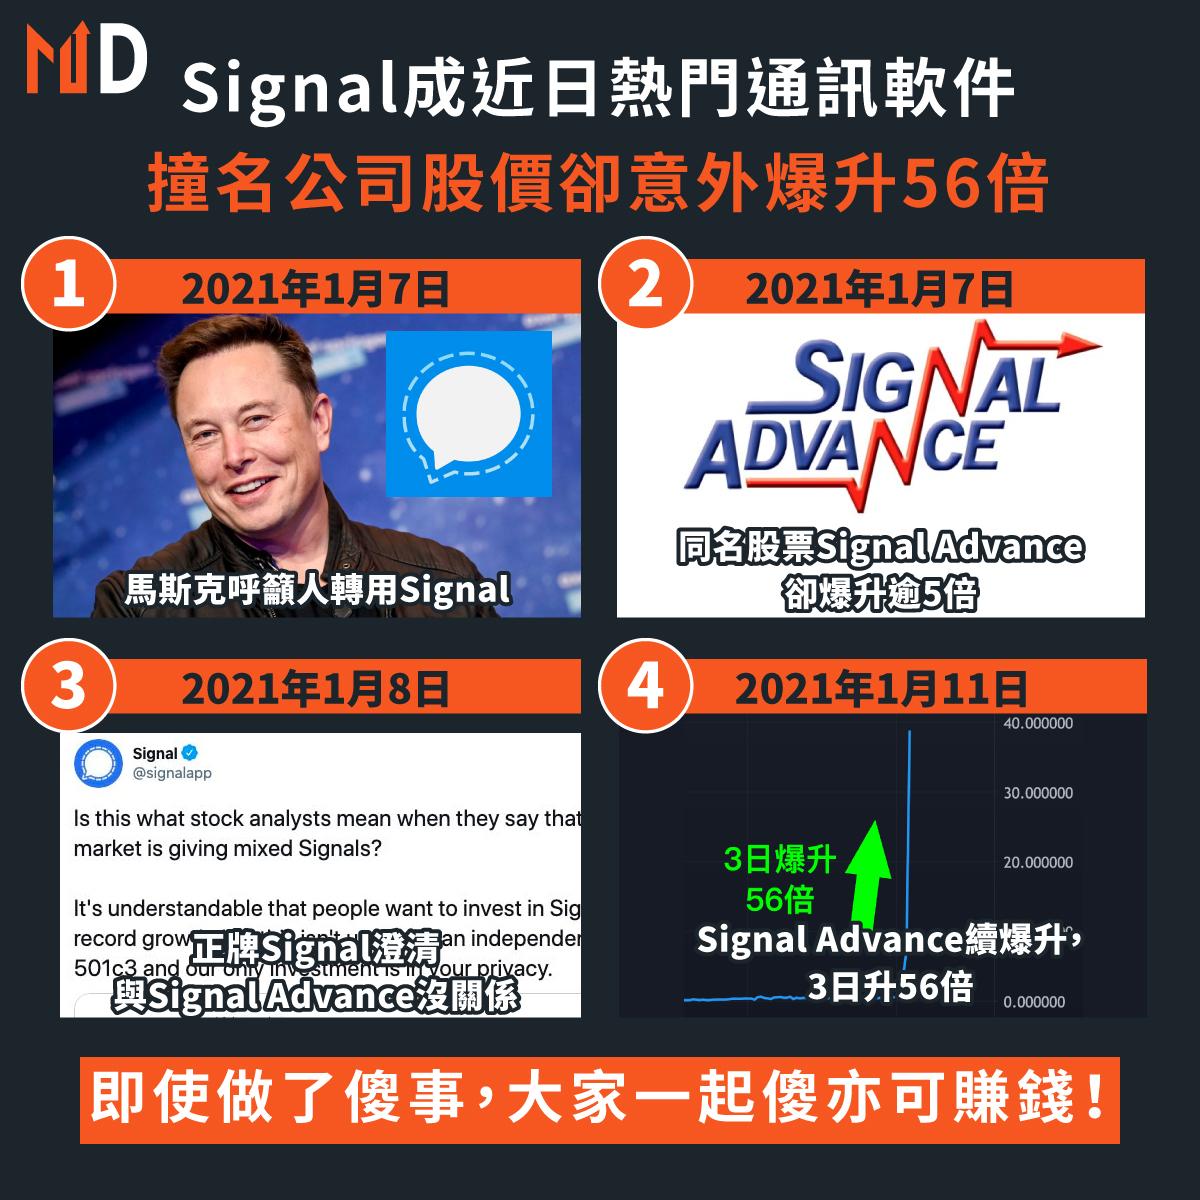 Signal成近日熱門通訊軟件,撞名公司股價卻意外爆升56倍